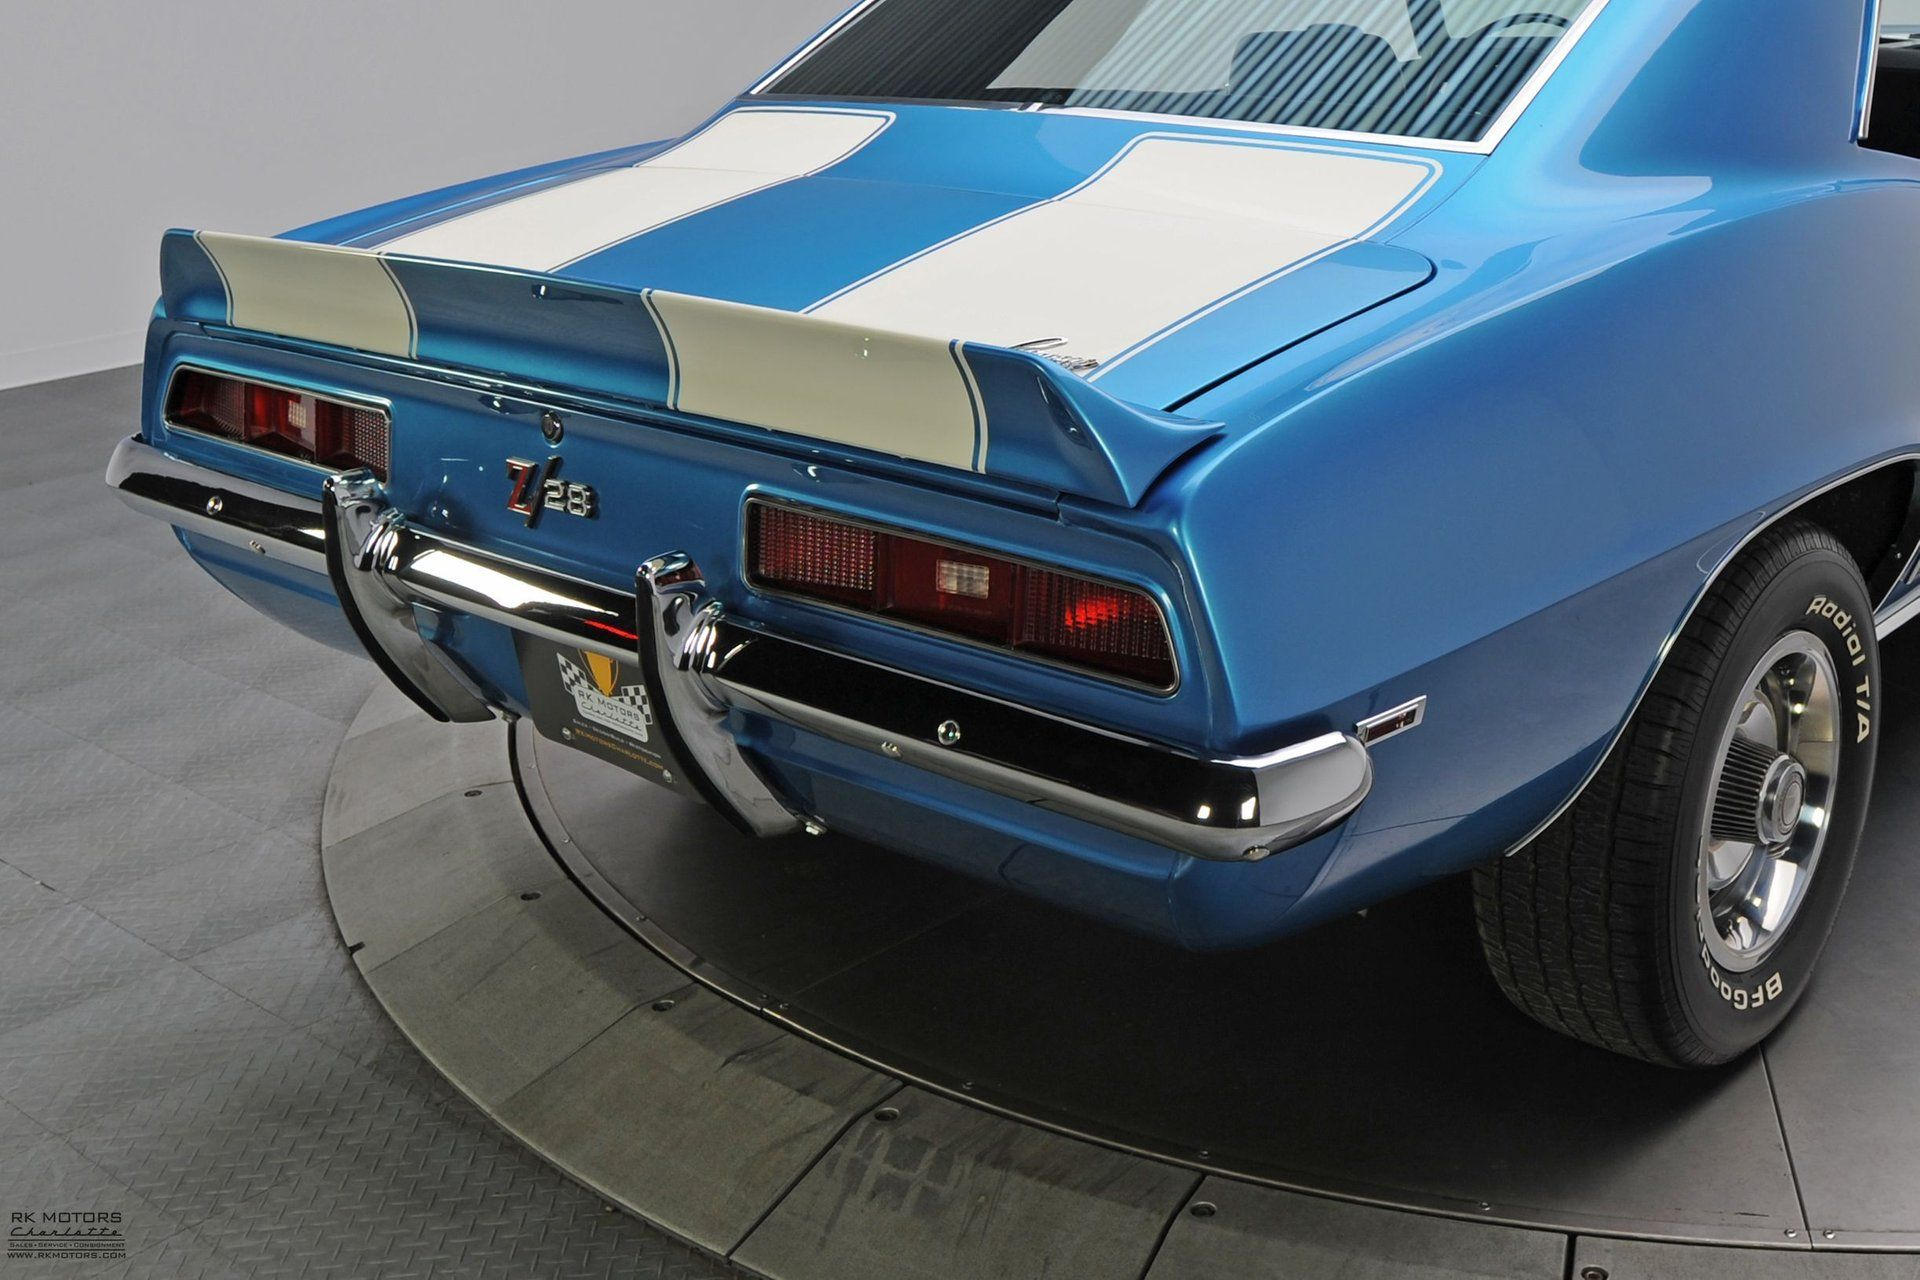 133281 1969 chevrolet camaro rk motors classic cars and